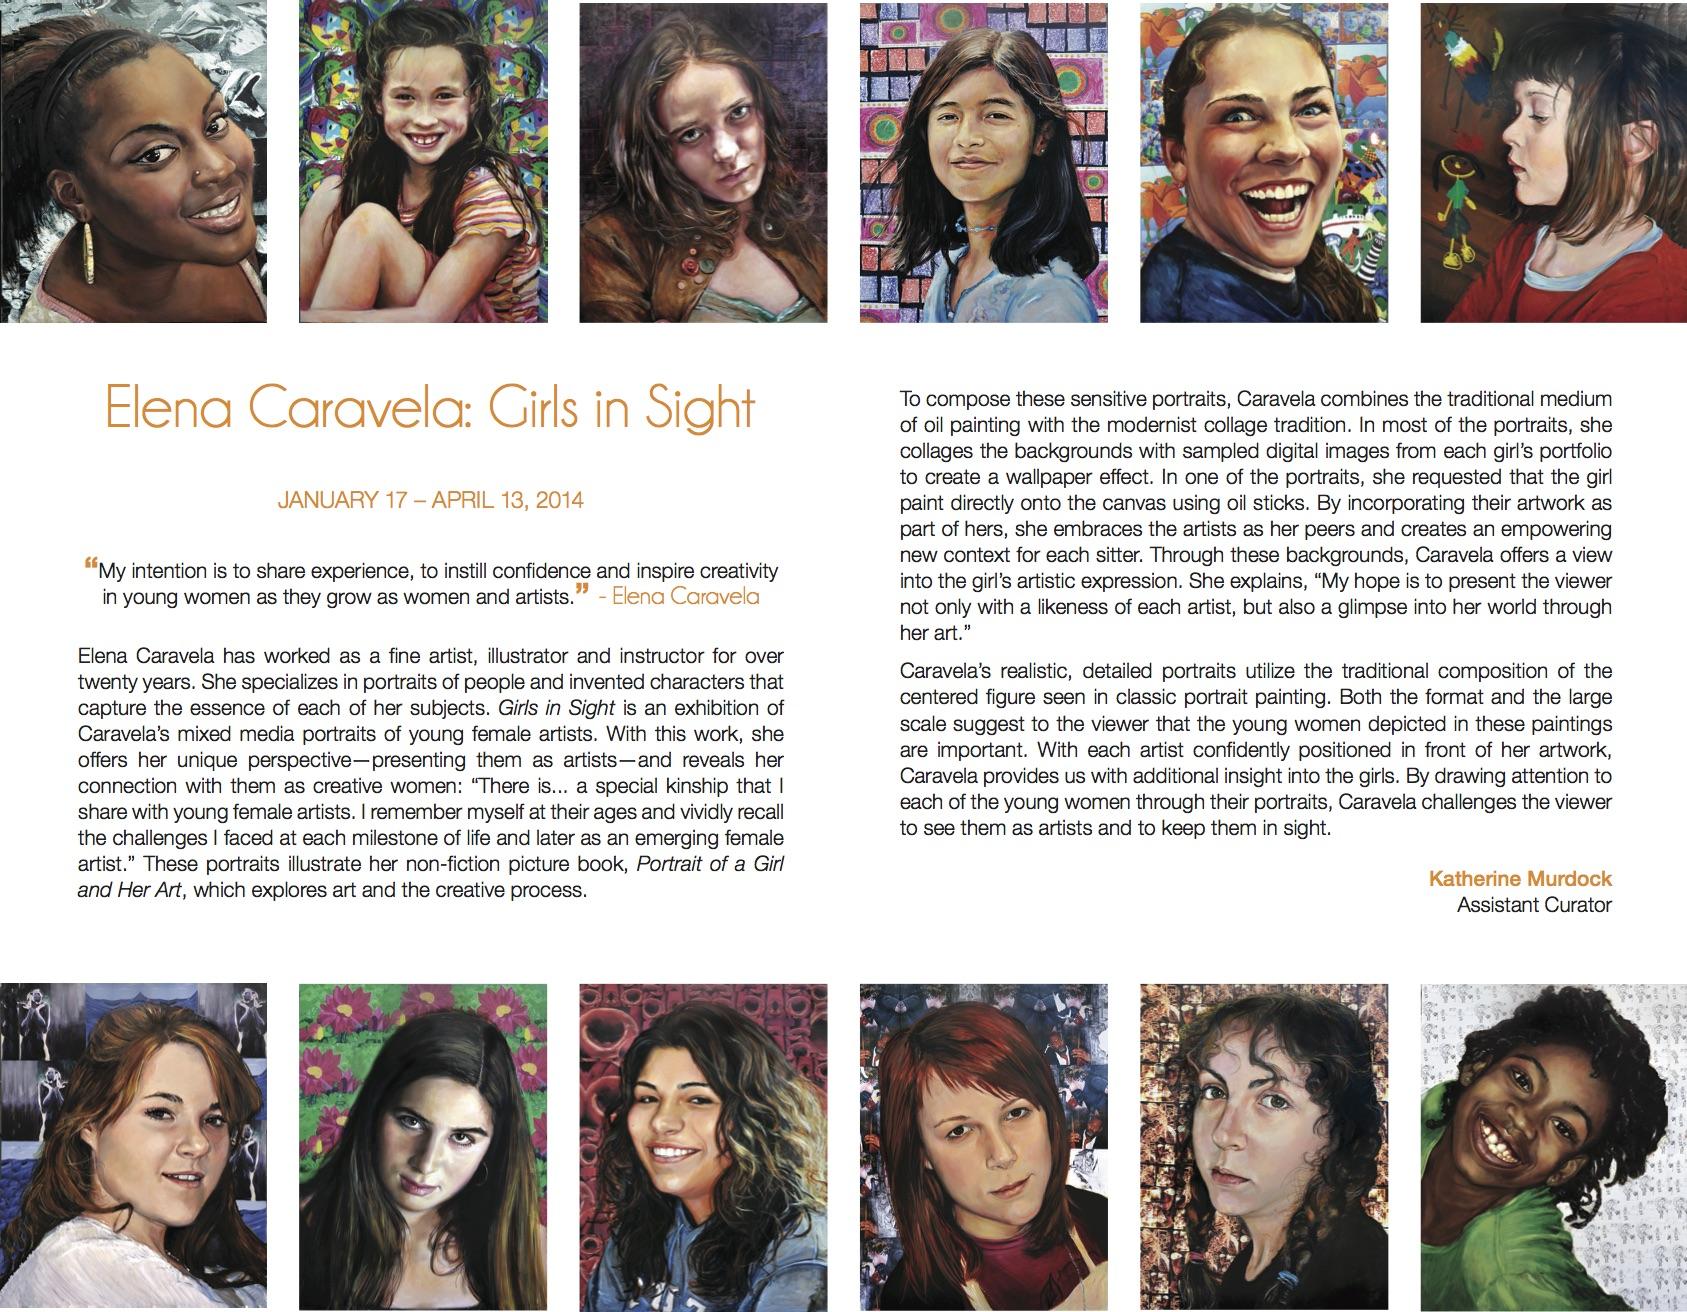 Elena Caravela: Girls in Sight, brochure (inside)